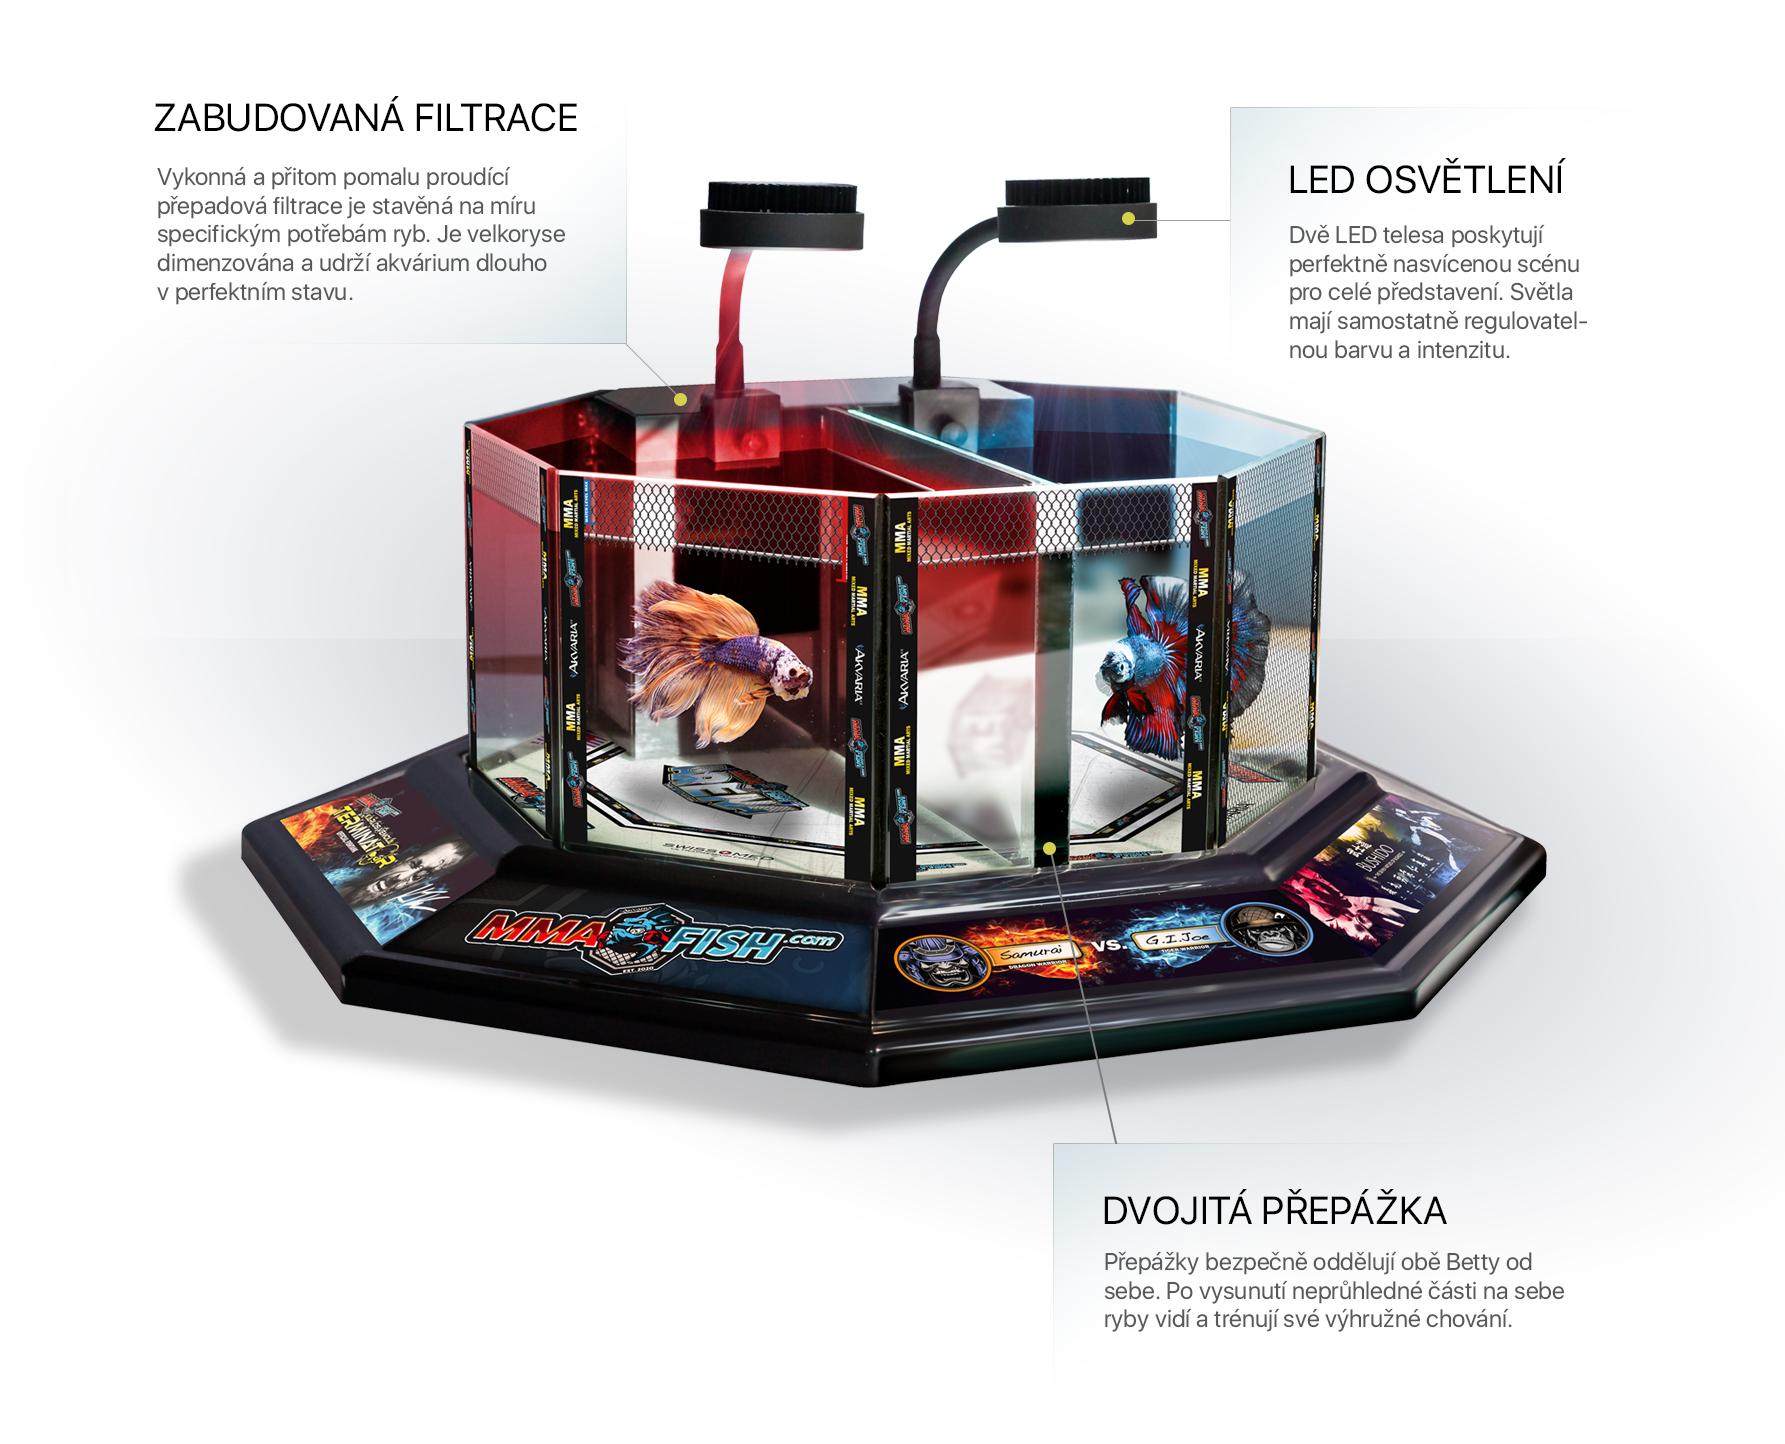 Speciální malé akvárium MMA Fisch, ambasador Karlos Vémola